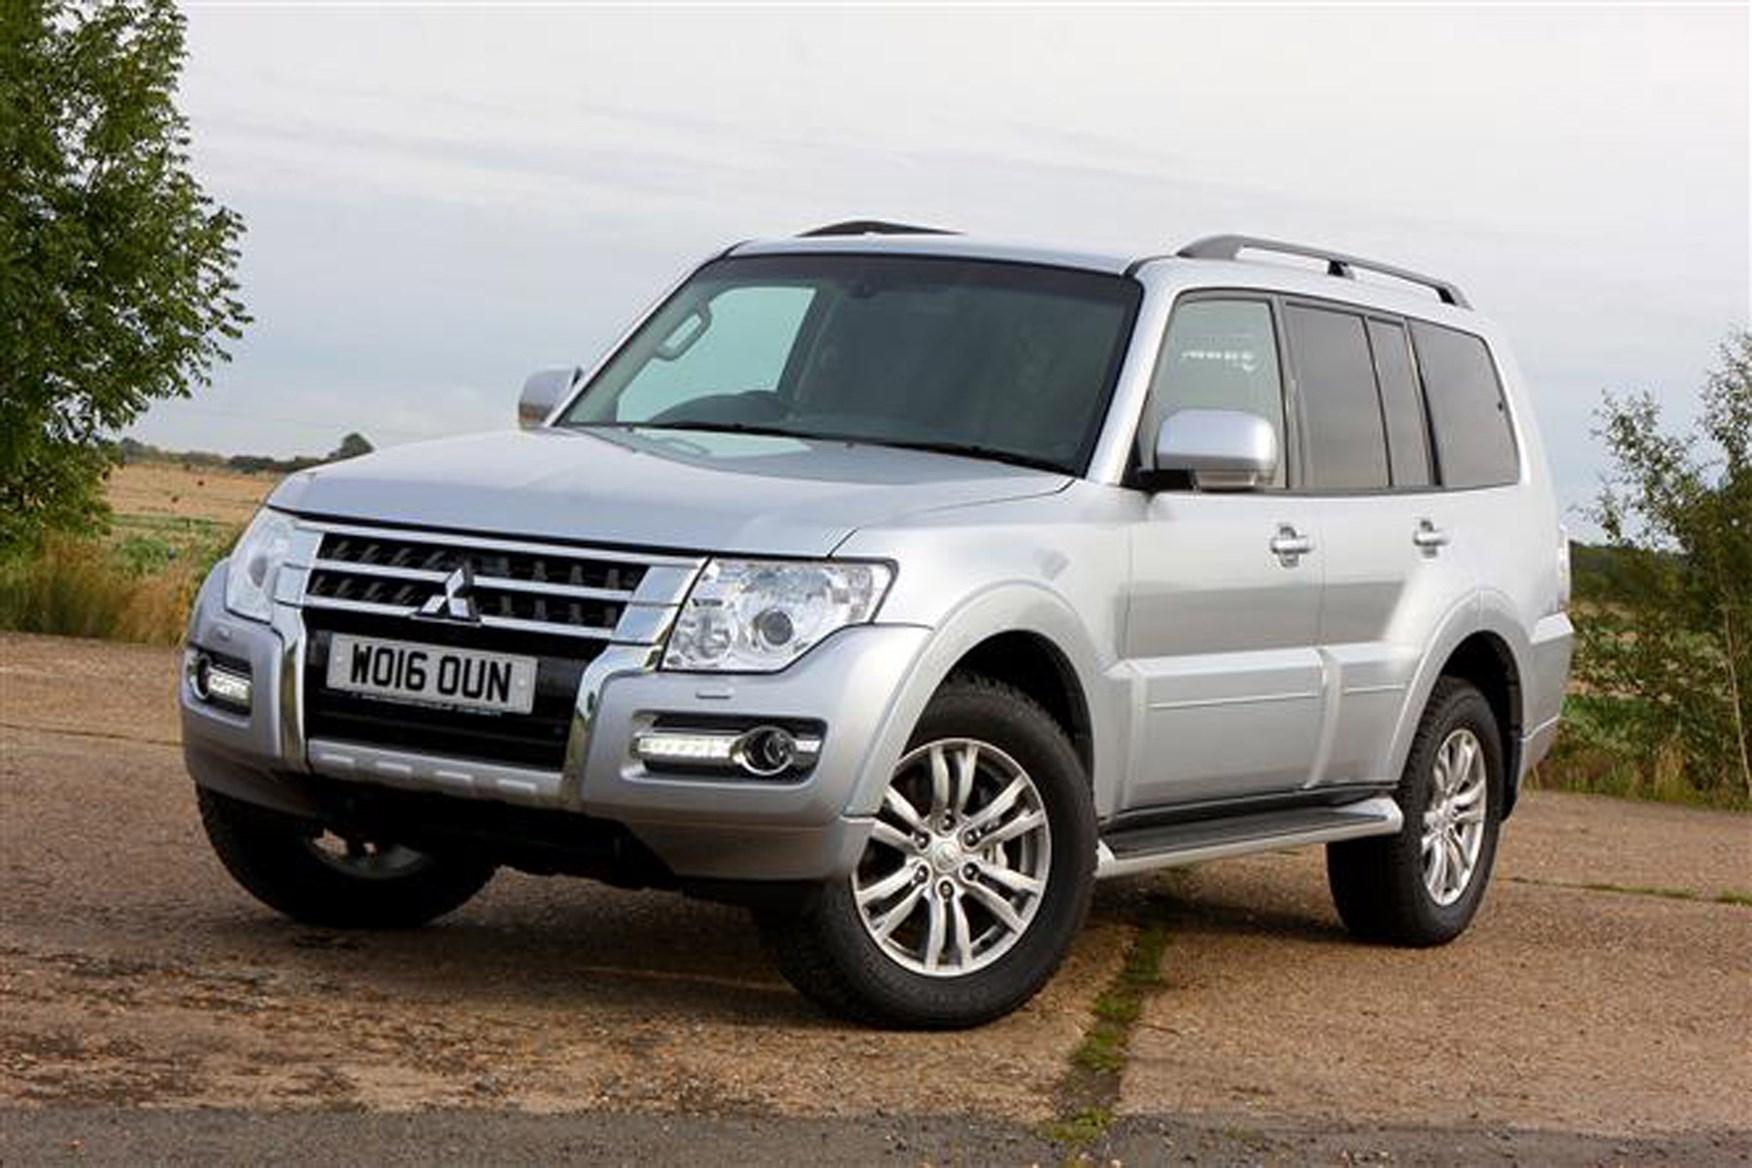 Mitsubishi Shogun review on Parkers Vans - exterior